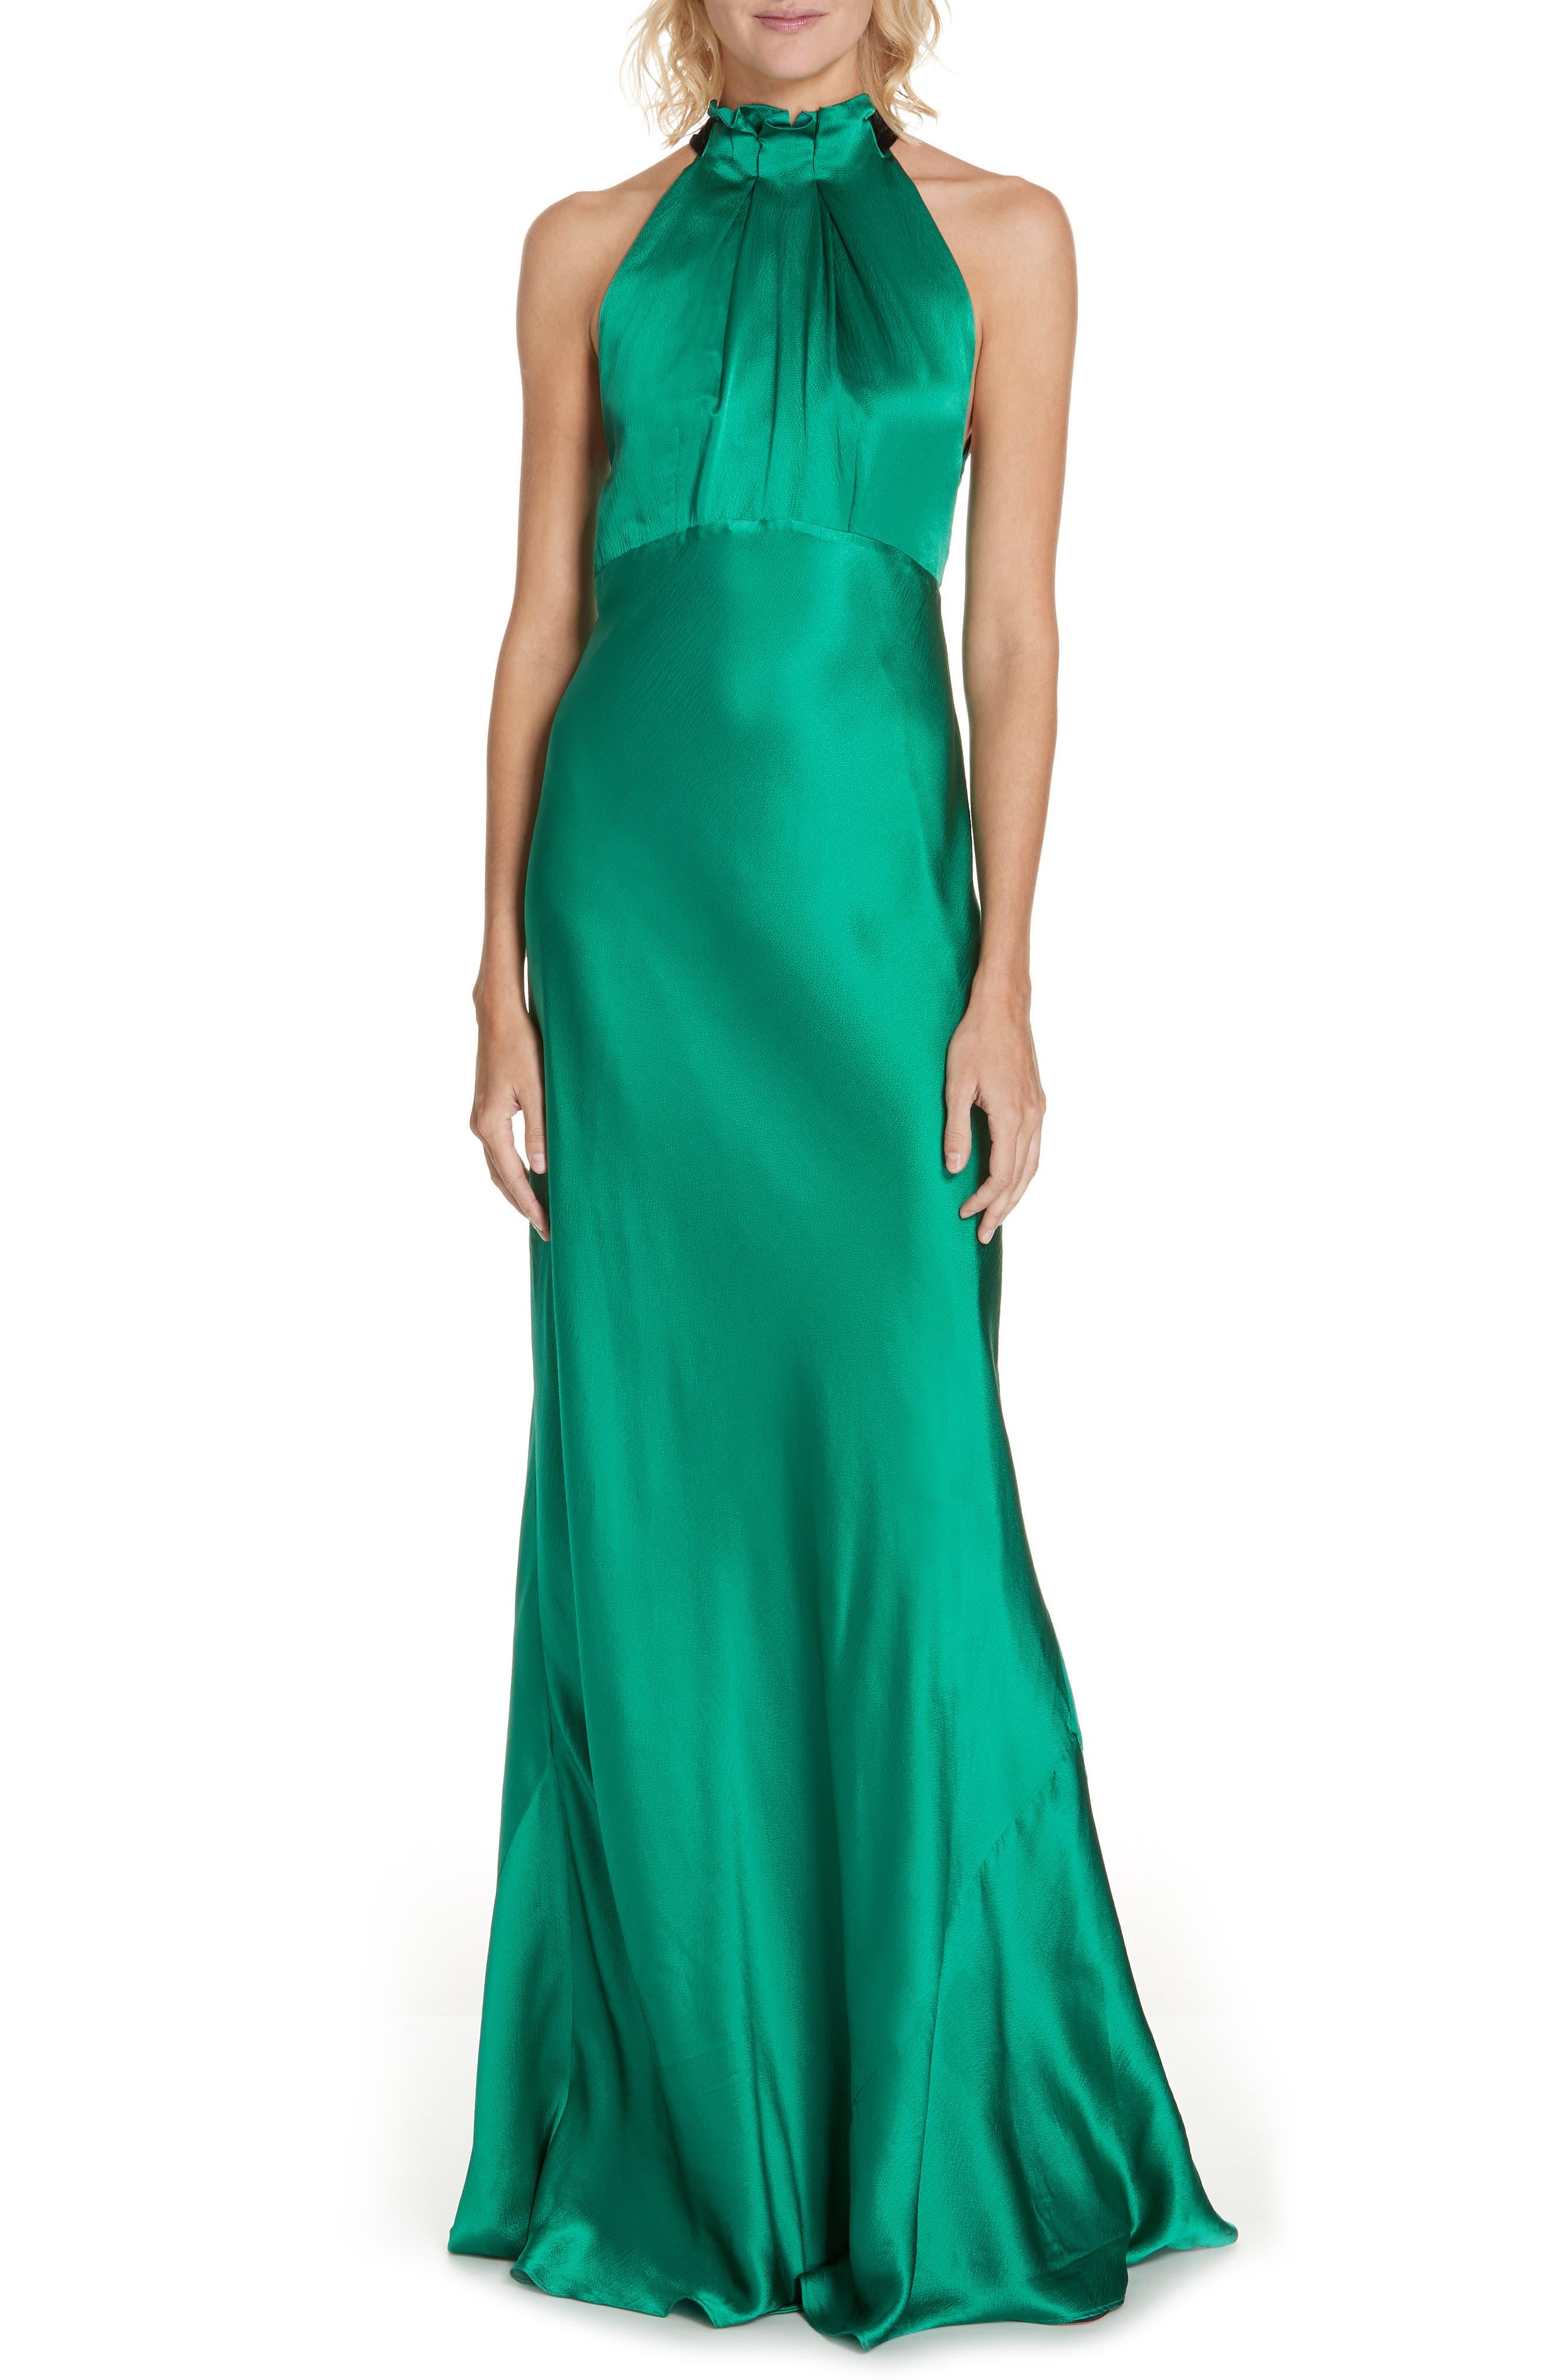 Michelle Velvet Bow Silk Halter Gown,                         Main,                         color, EMERALD GREEN